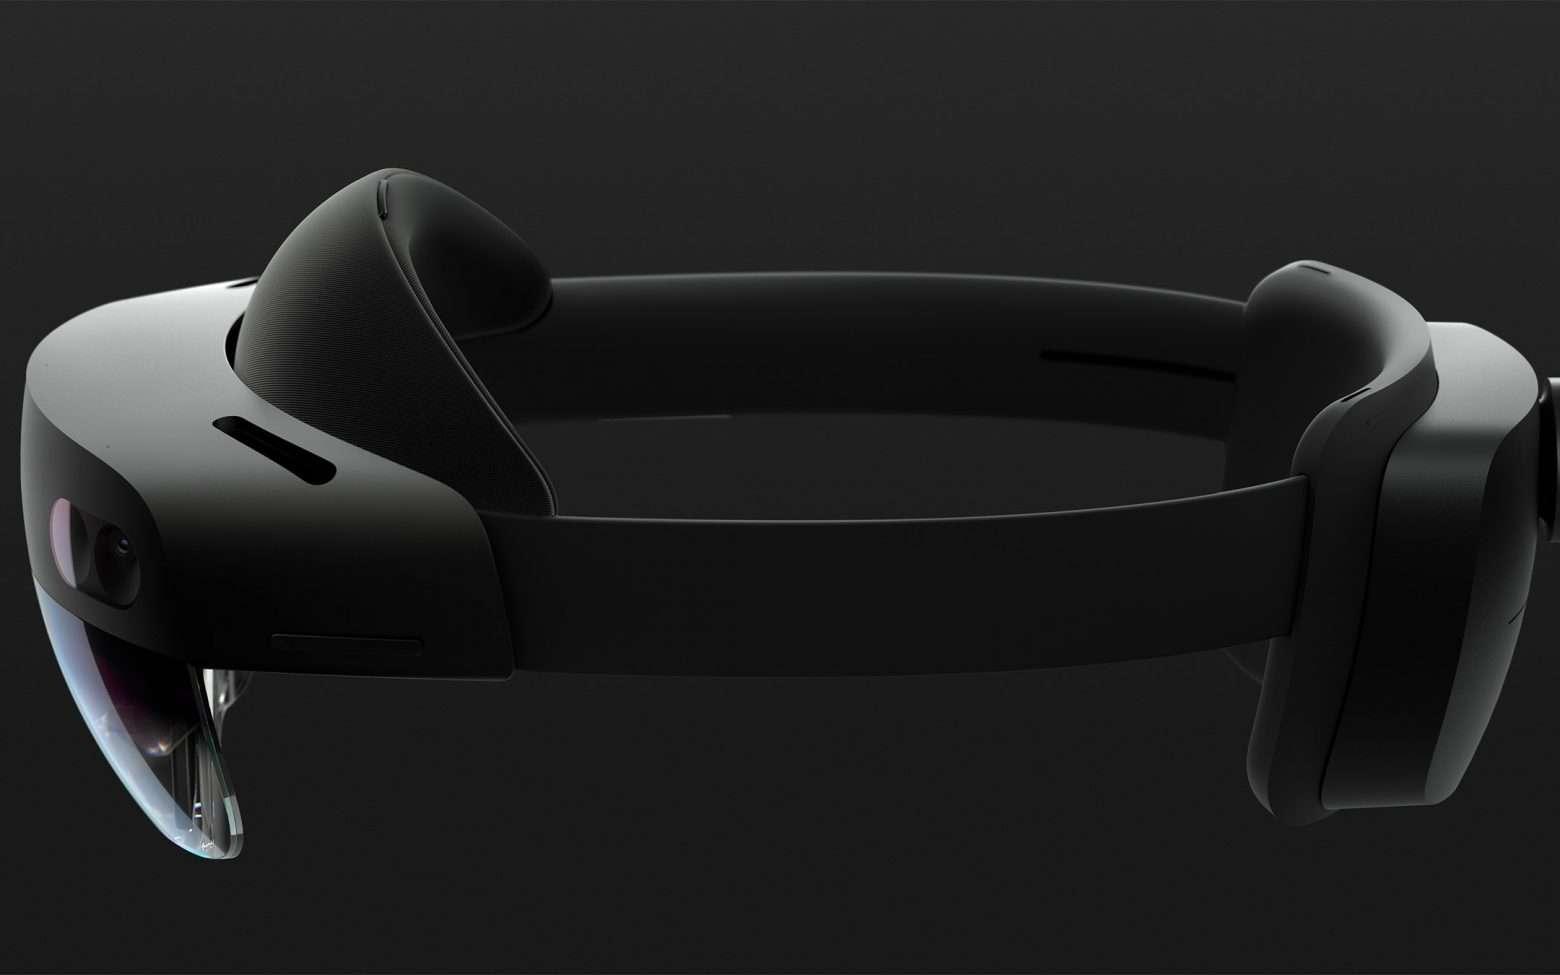 HoloLens per i militari USA: Microsoft tira dritto